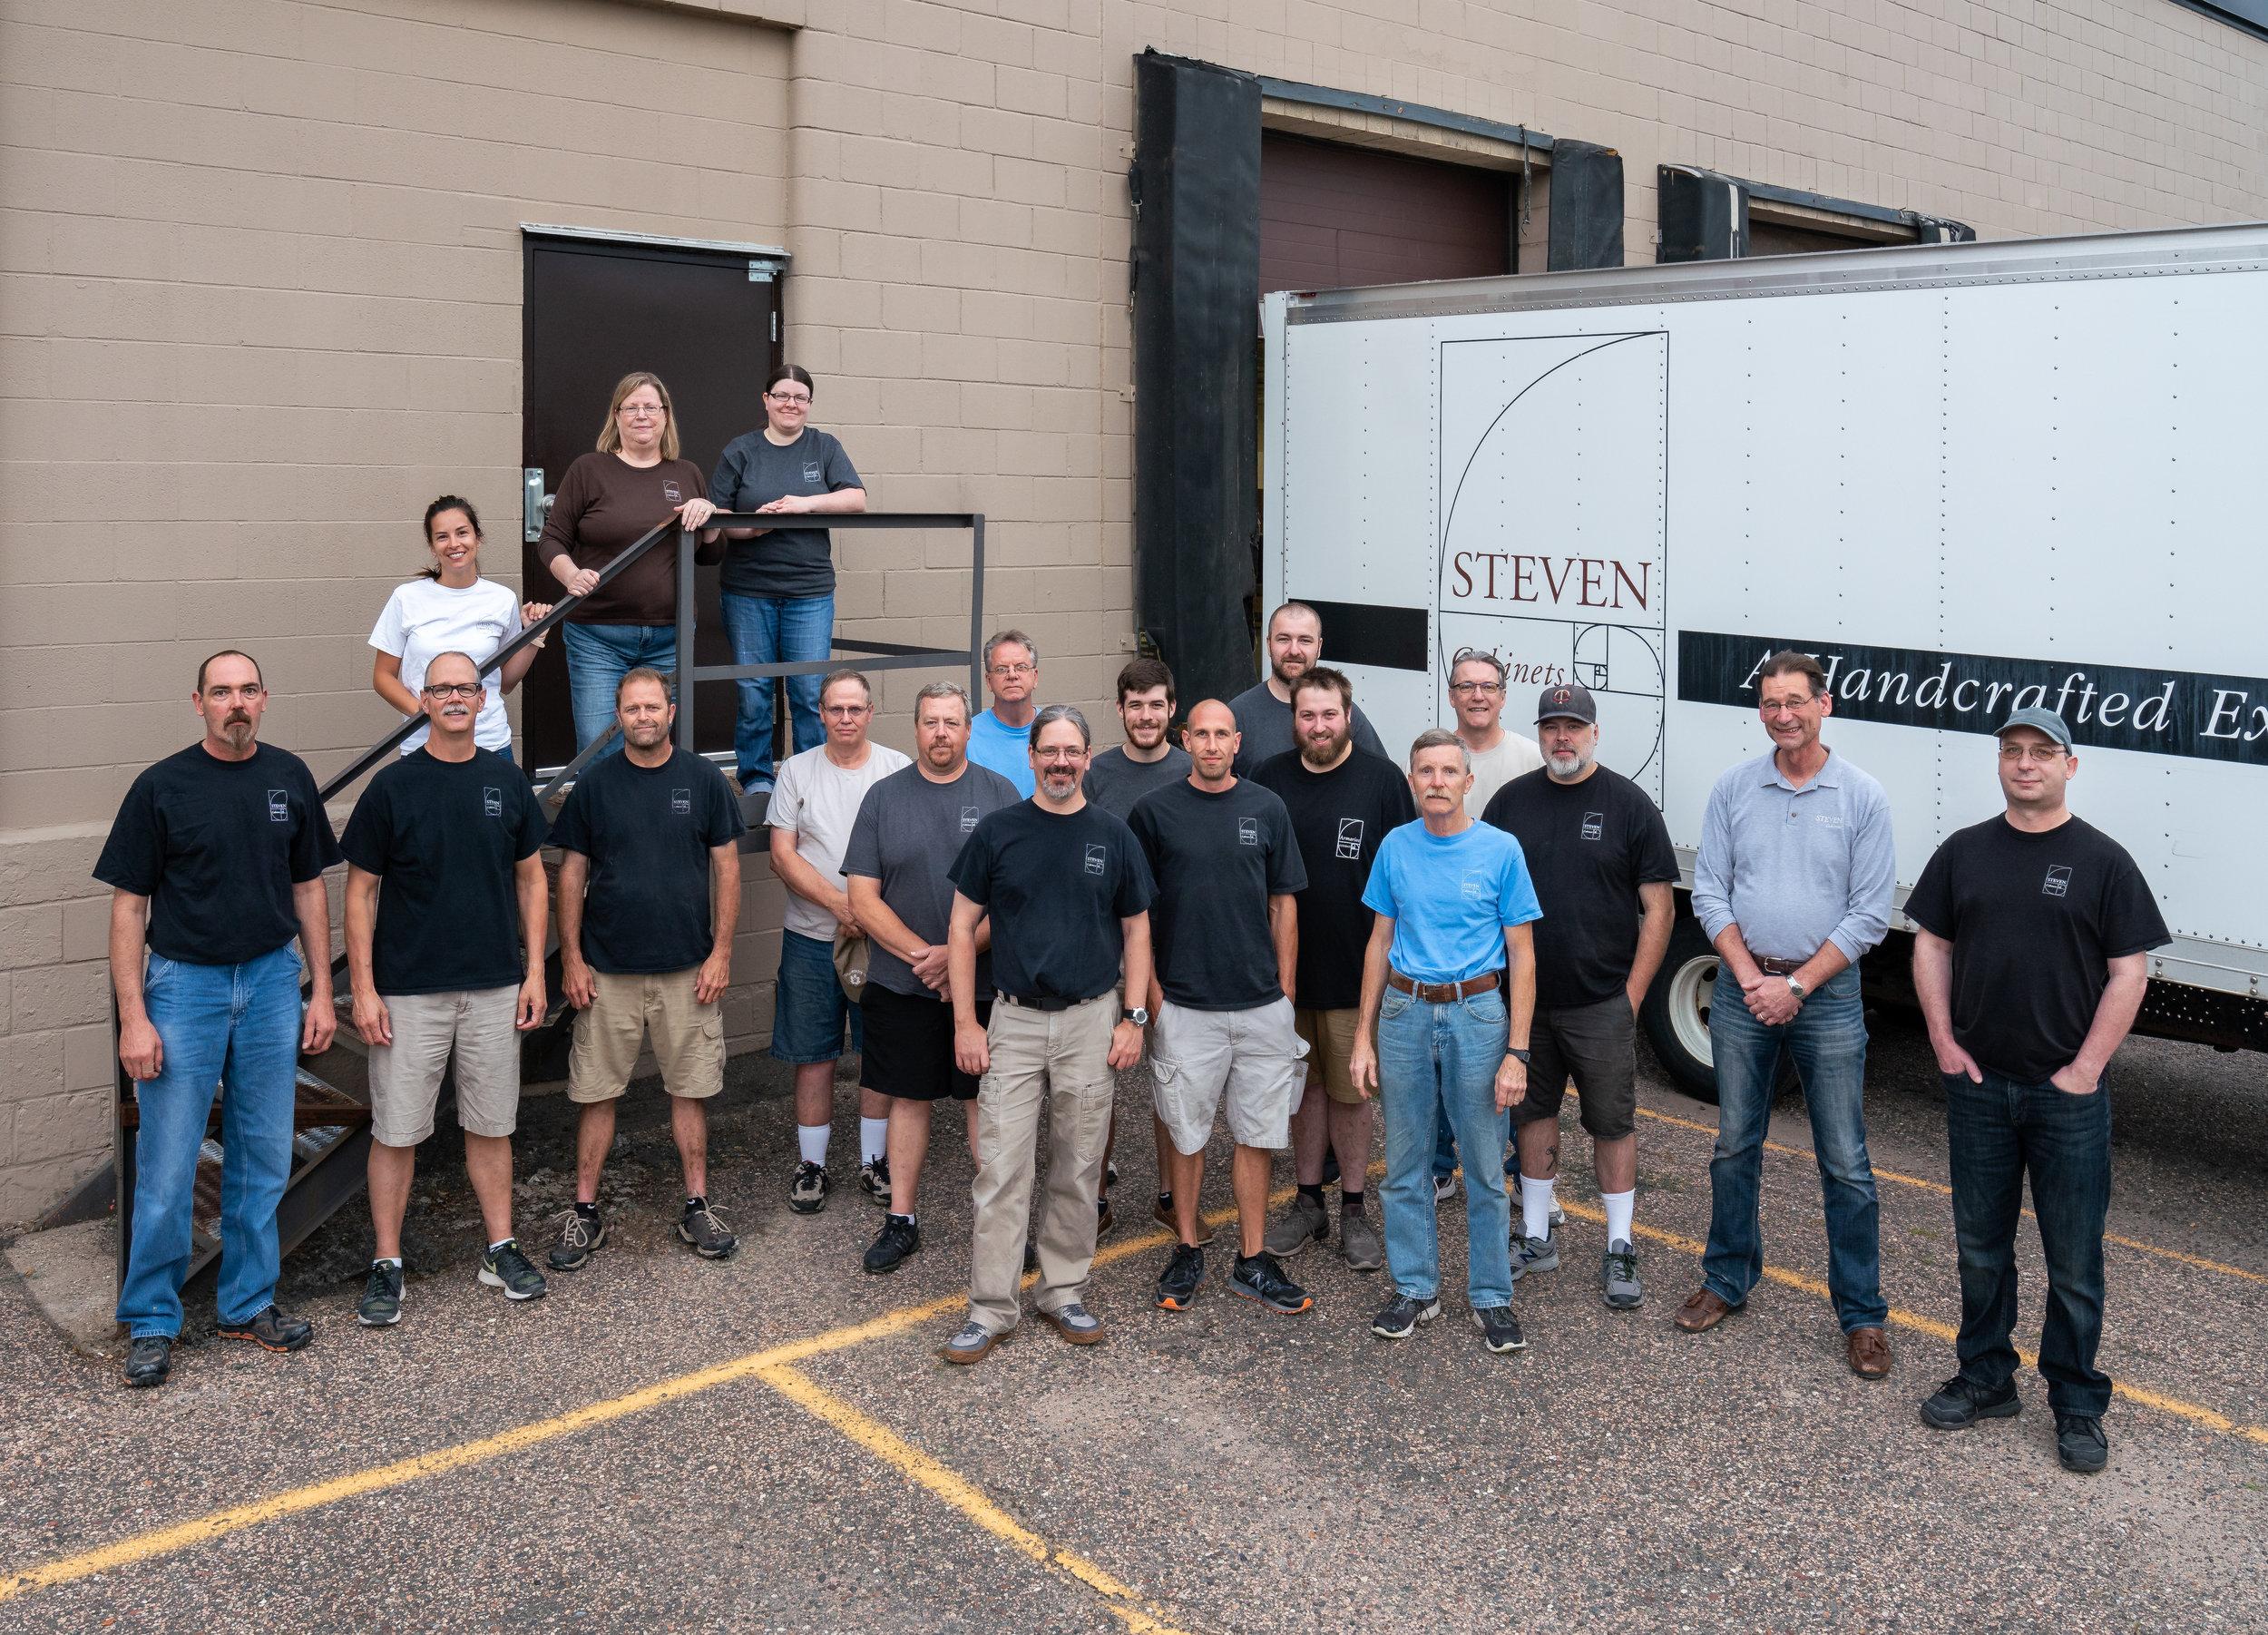 Steven Cabinets Company Photo 2018